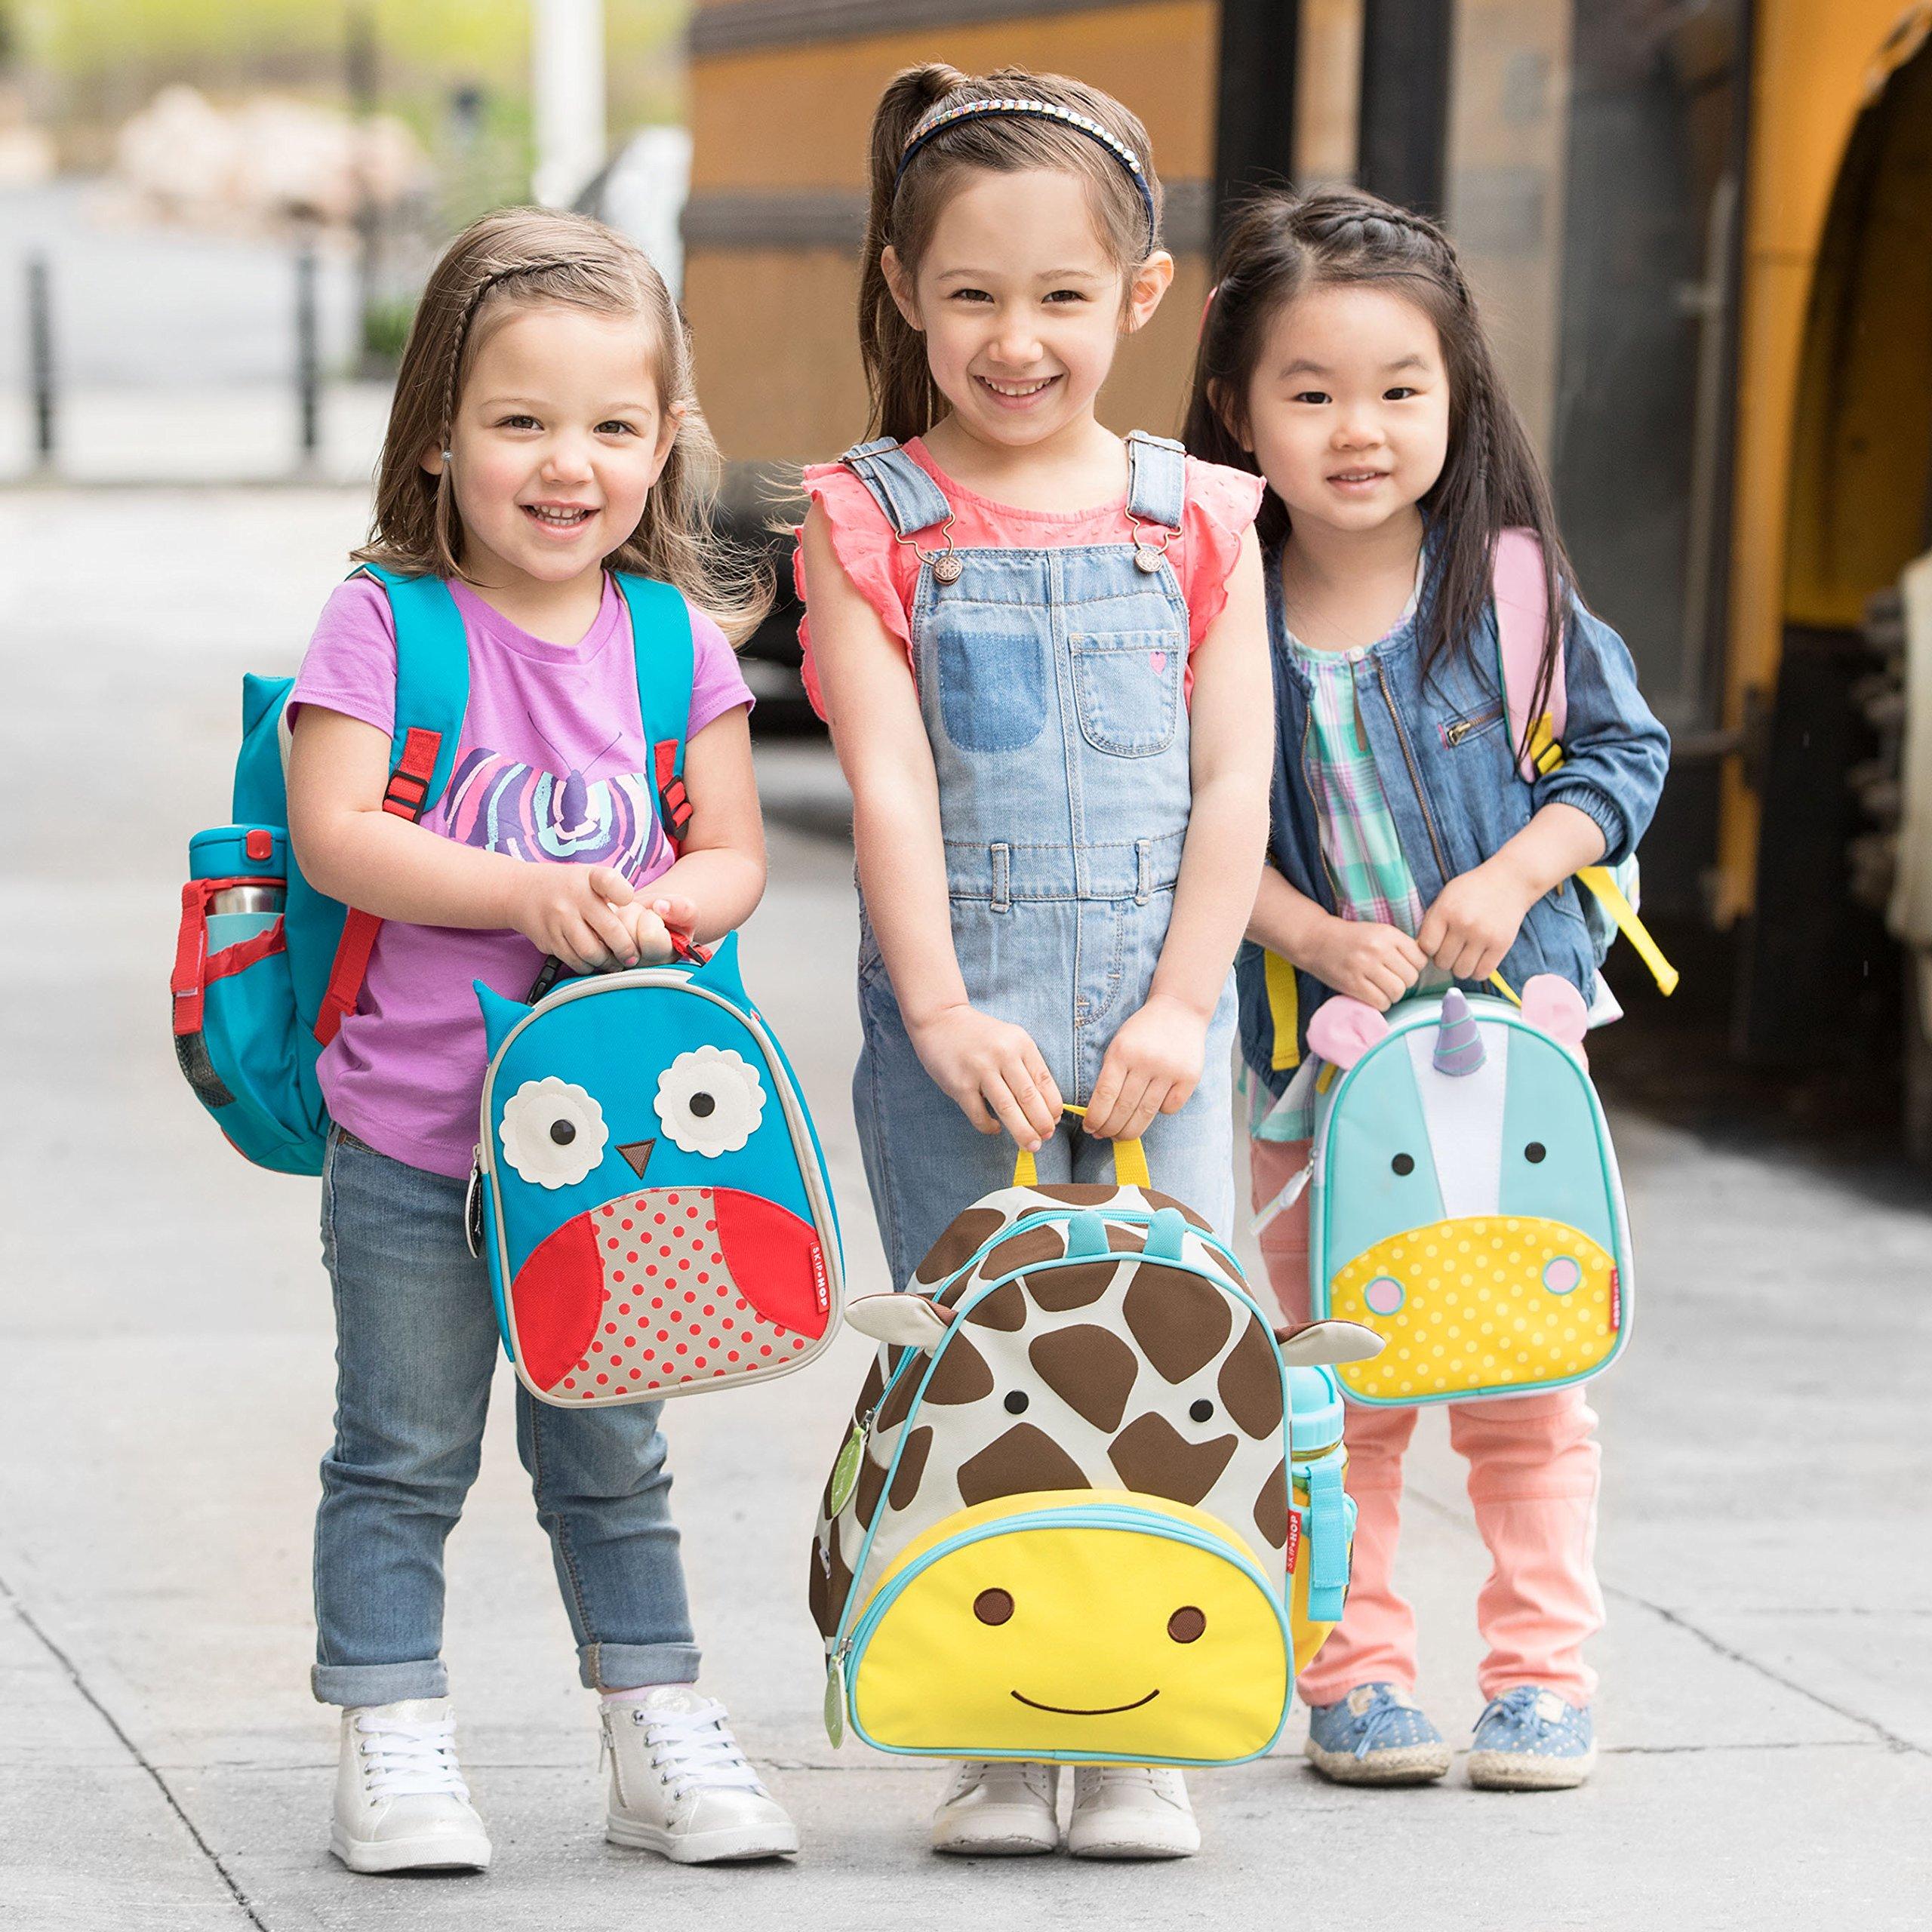 Skip Hop Zoo Kids Insulated Lunch Box, Eureka Unicorn, 9''x3.25''x7.5'', Multi Colored